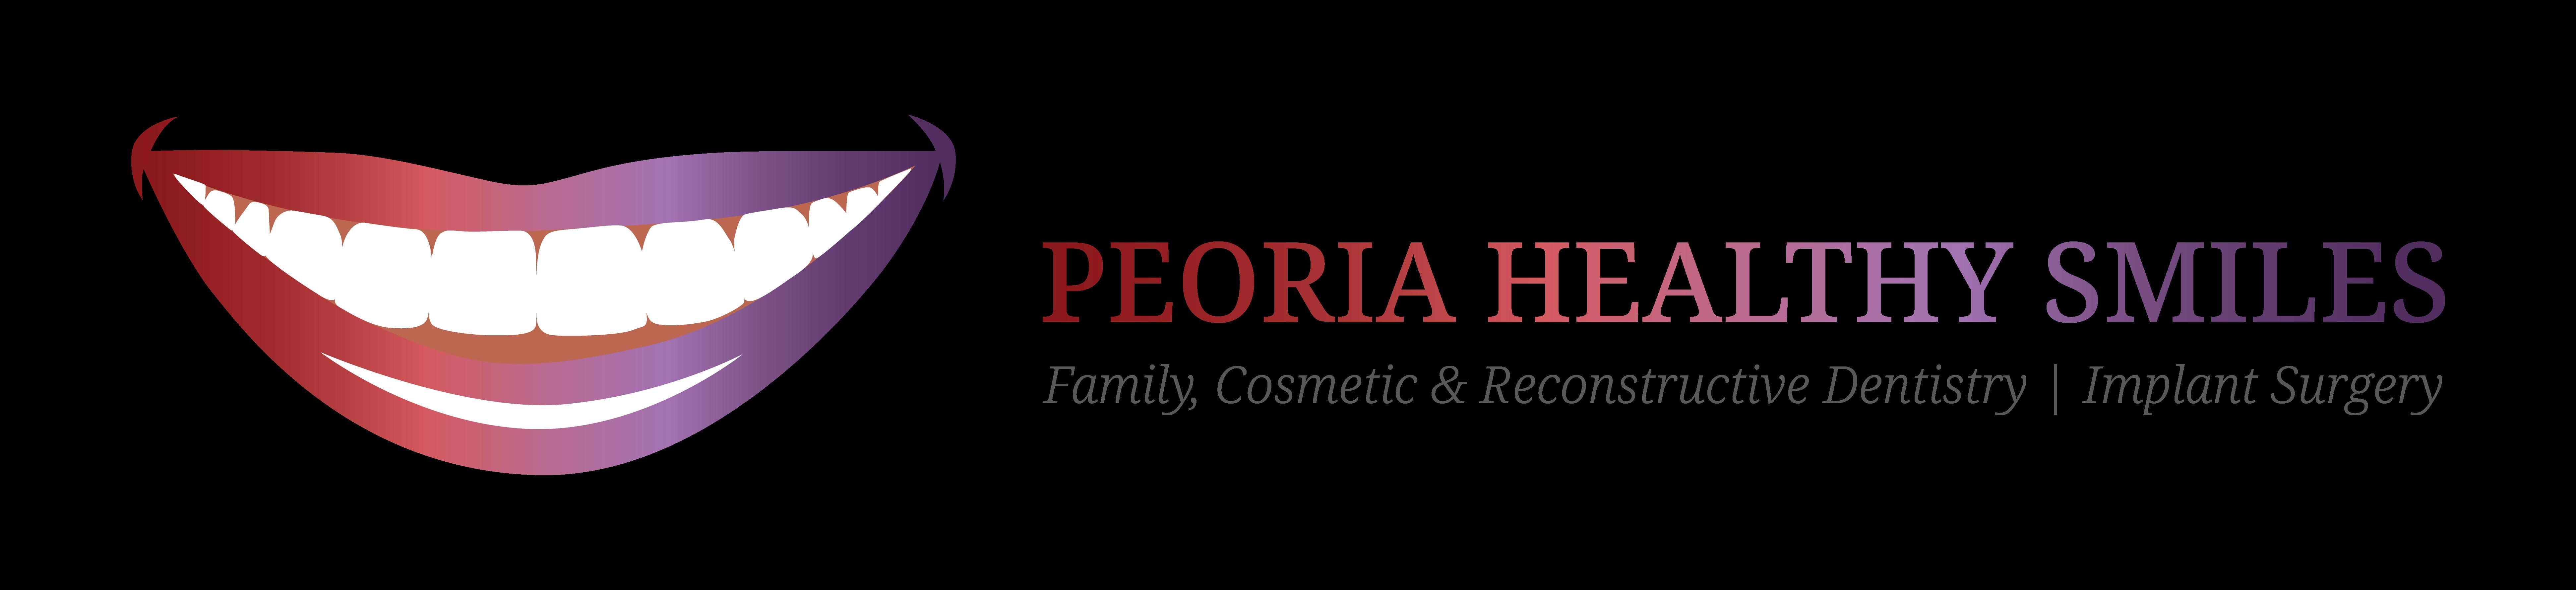 Peoria Healthy Smiles